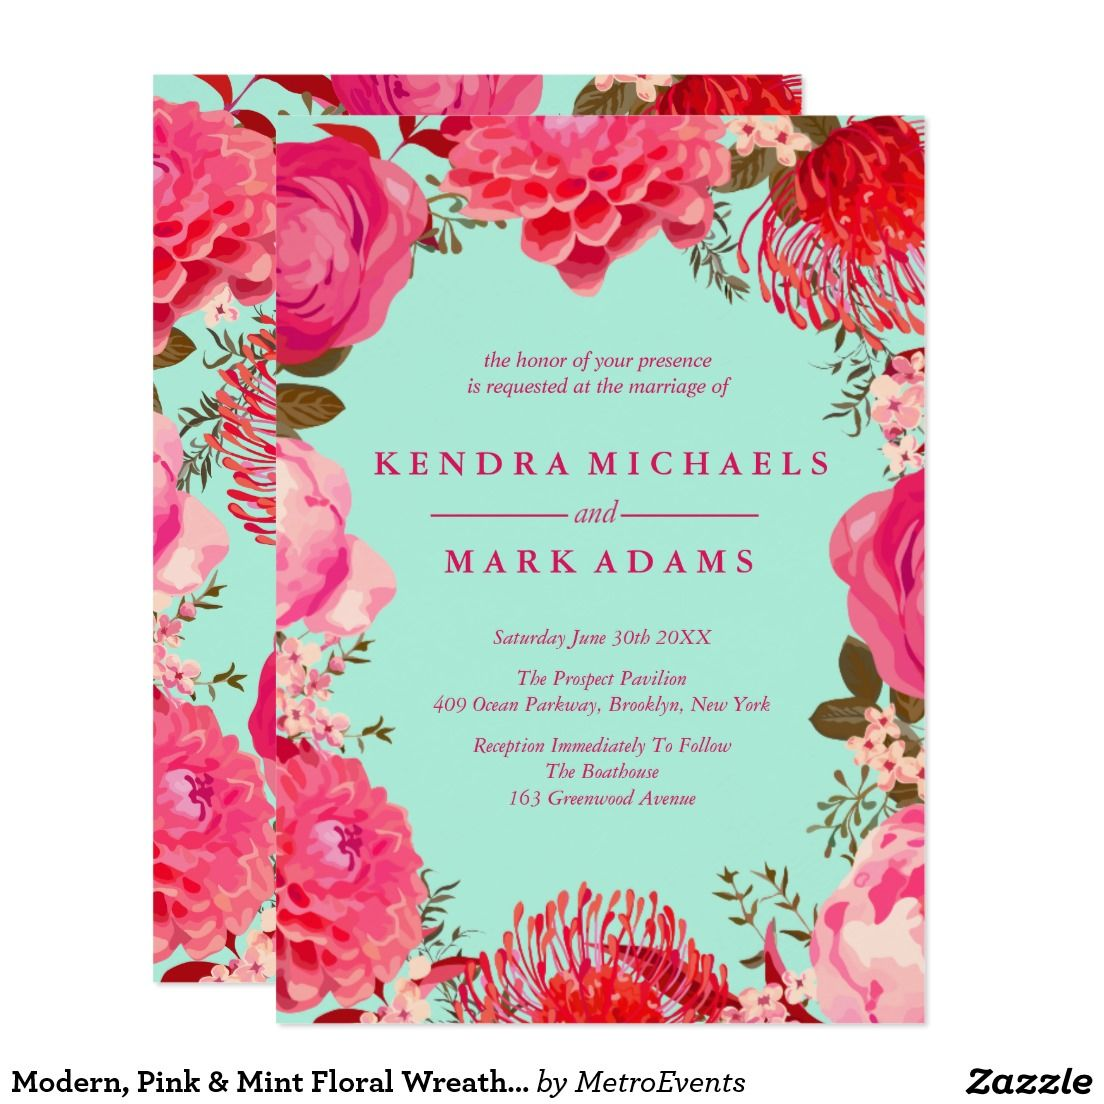 Modern, Pink & Mint Floral Wreath Invitations